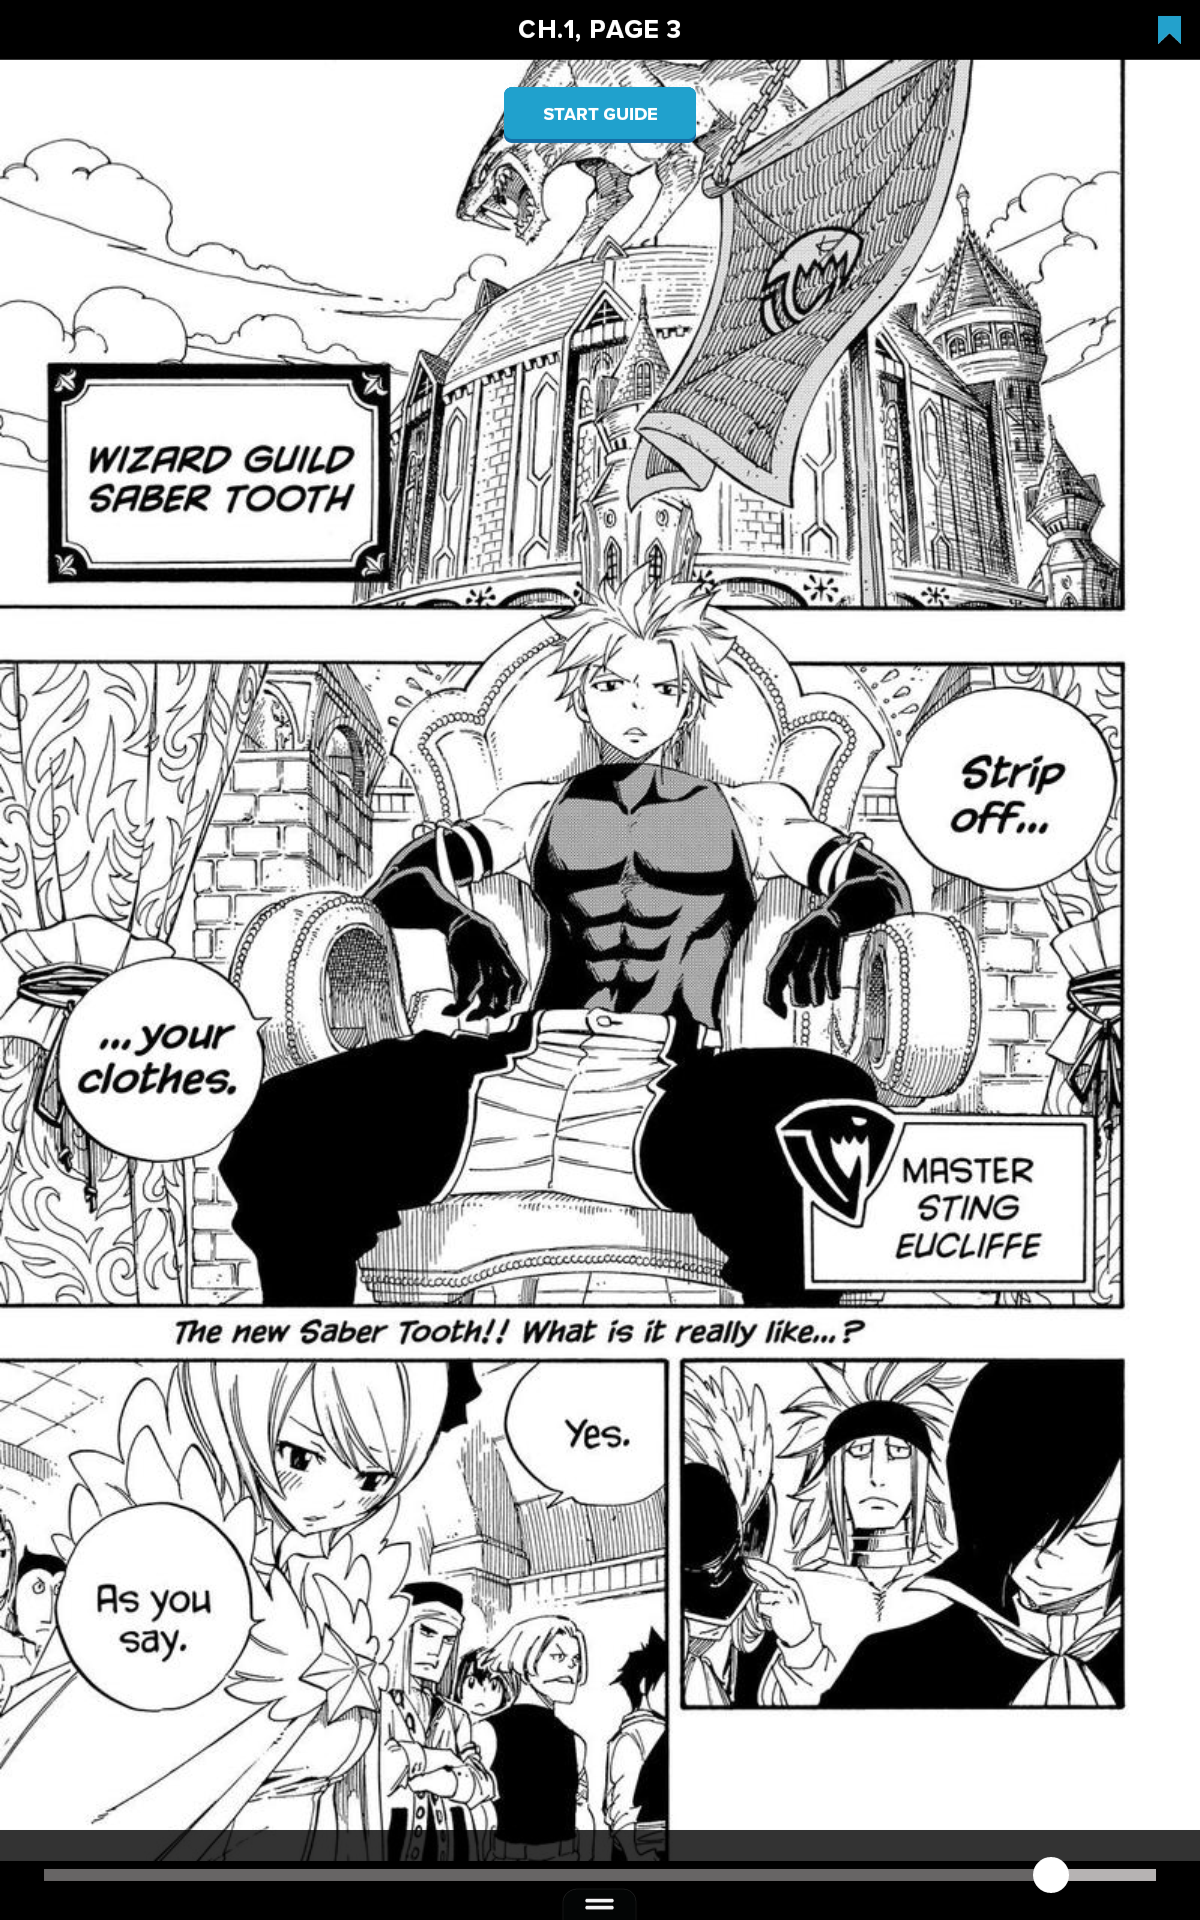 Crunchyroll Manga: Amazon.es: Appstore para Android